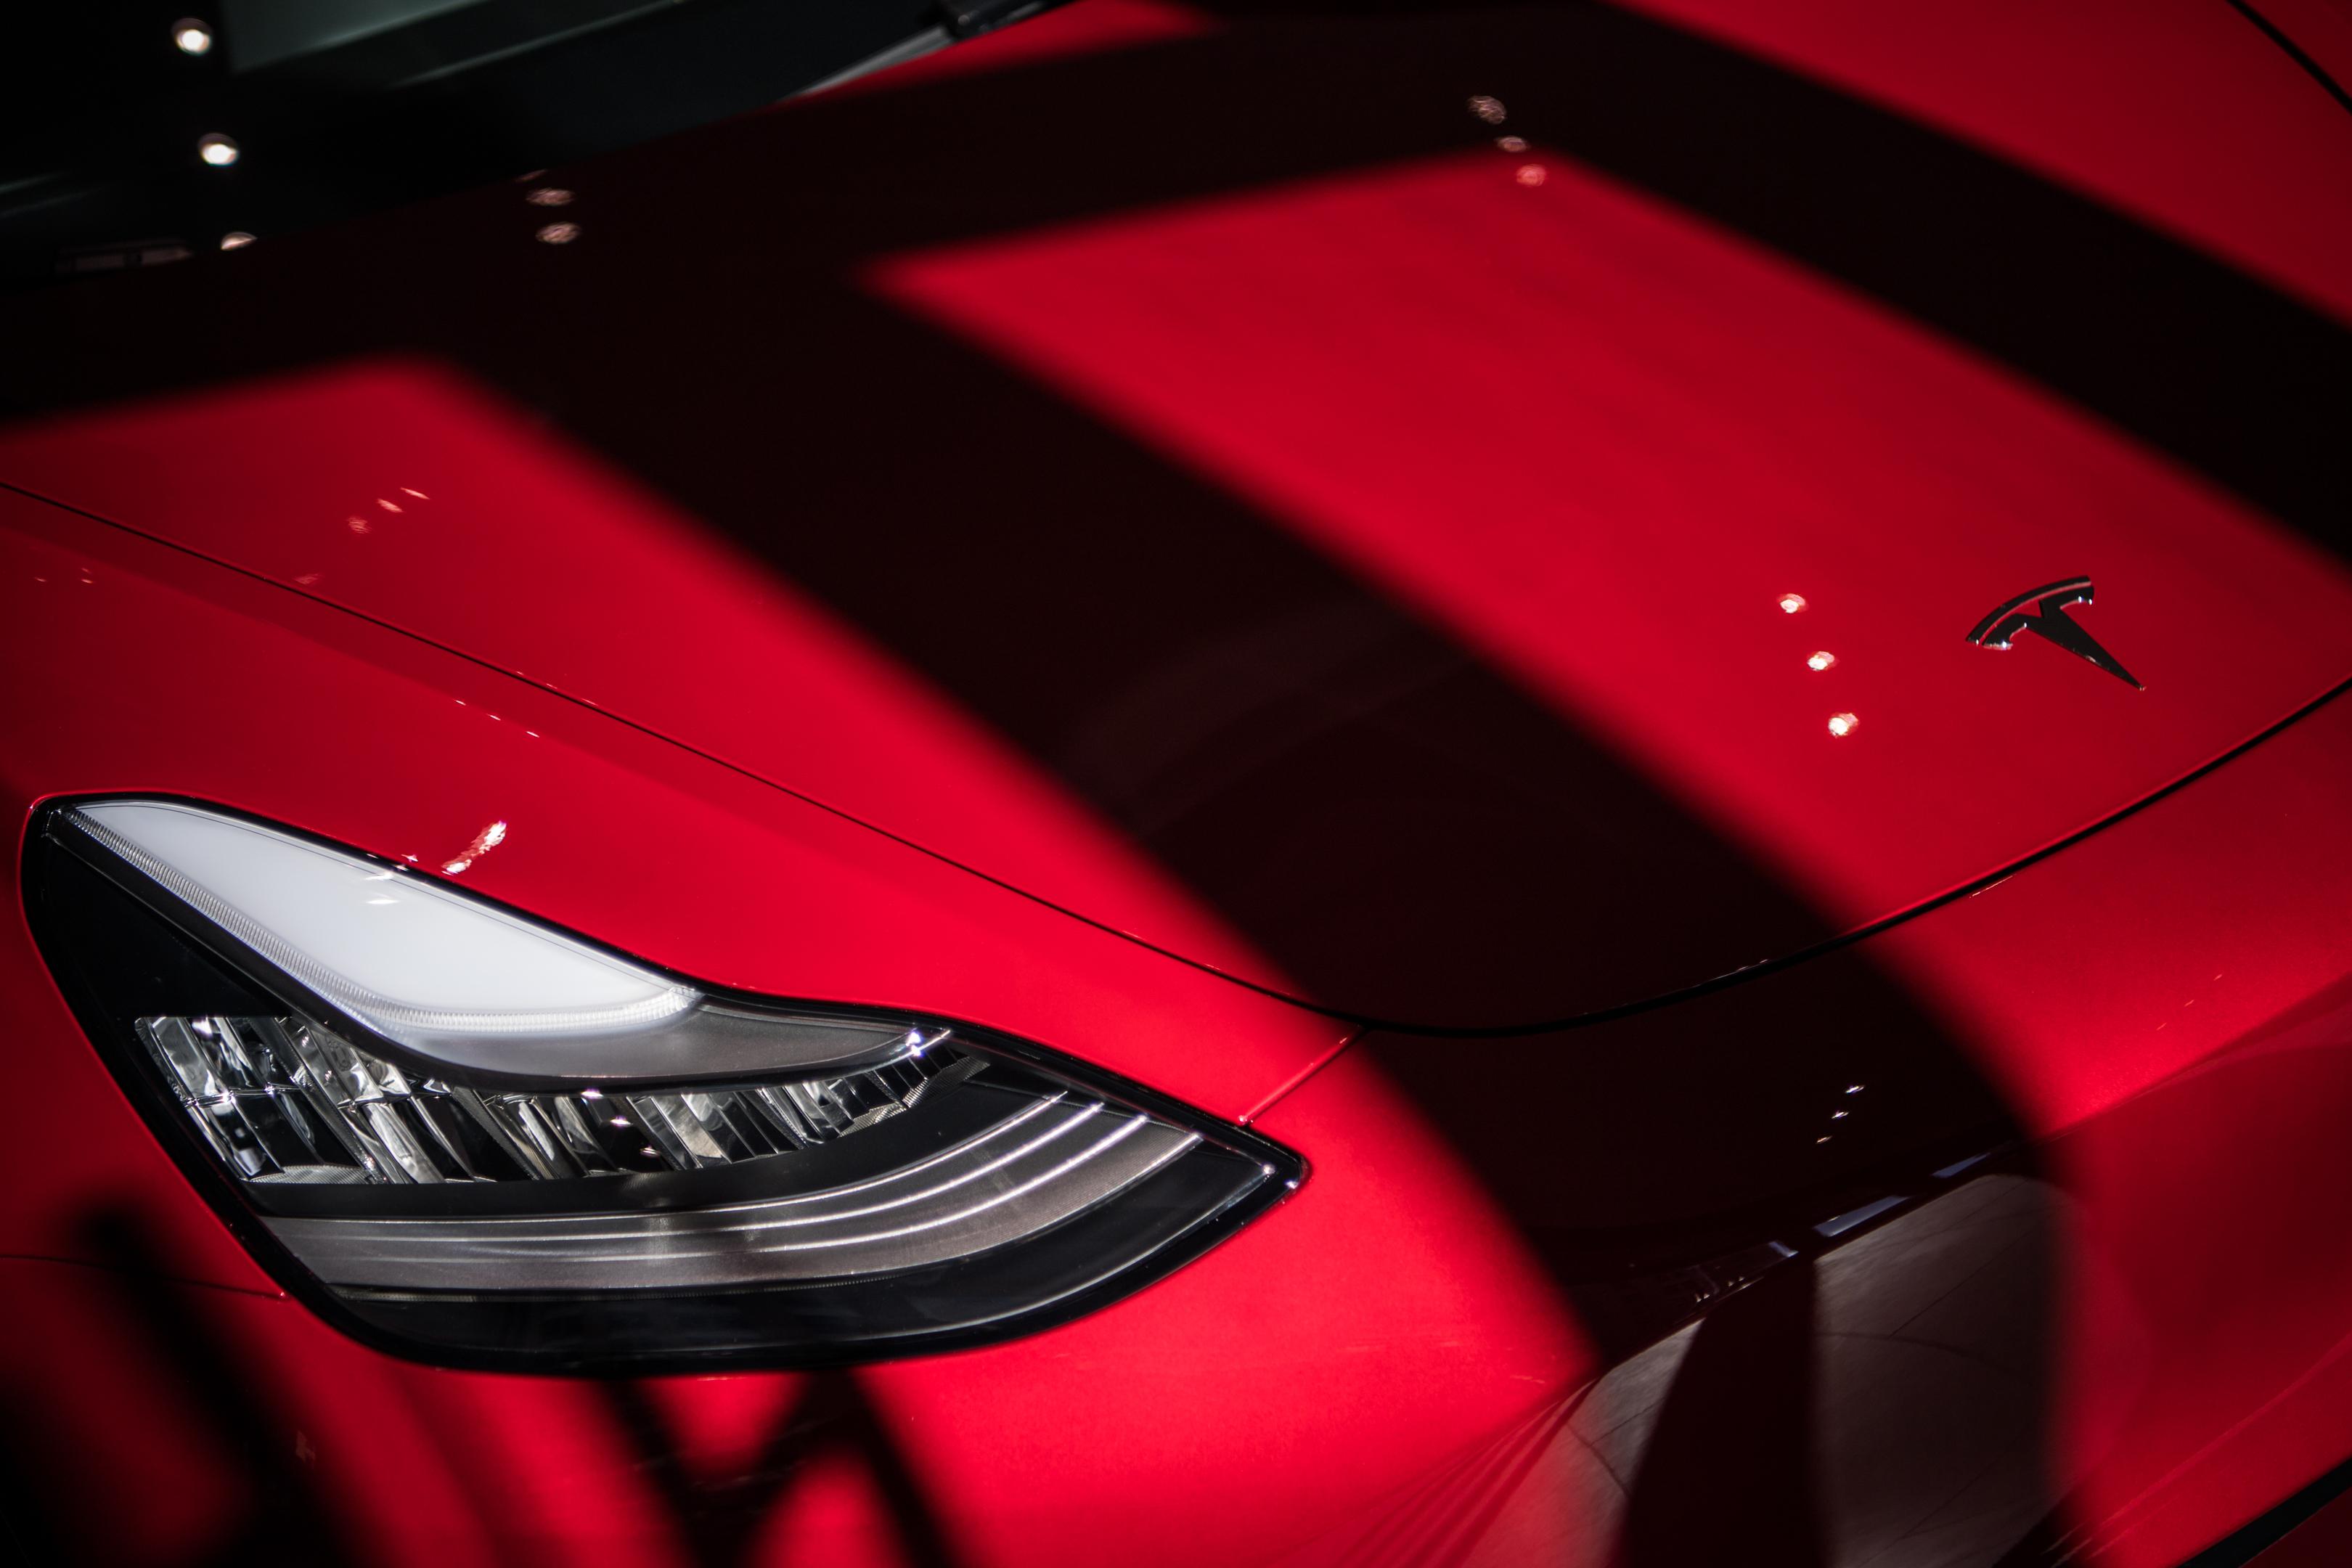 After subpoenaing Apple in trade secrets case, Tesla goes